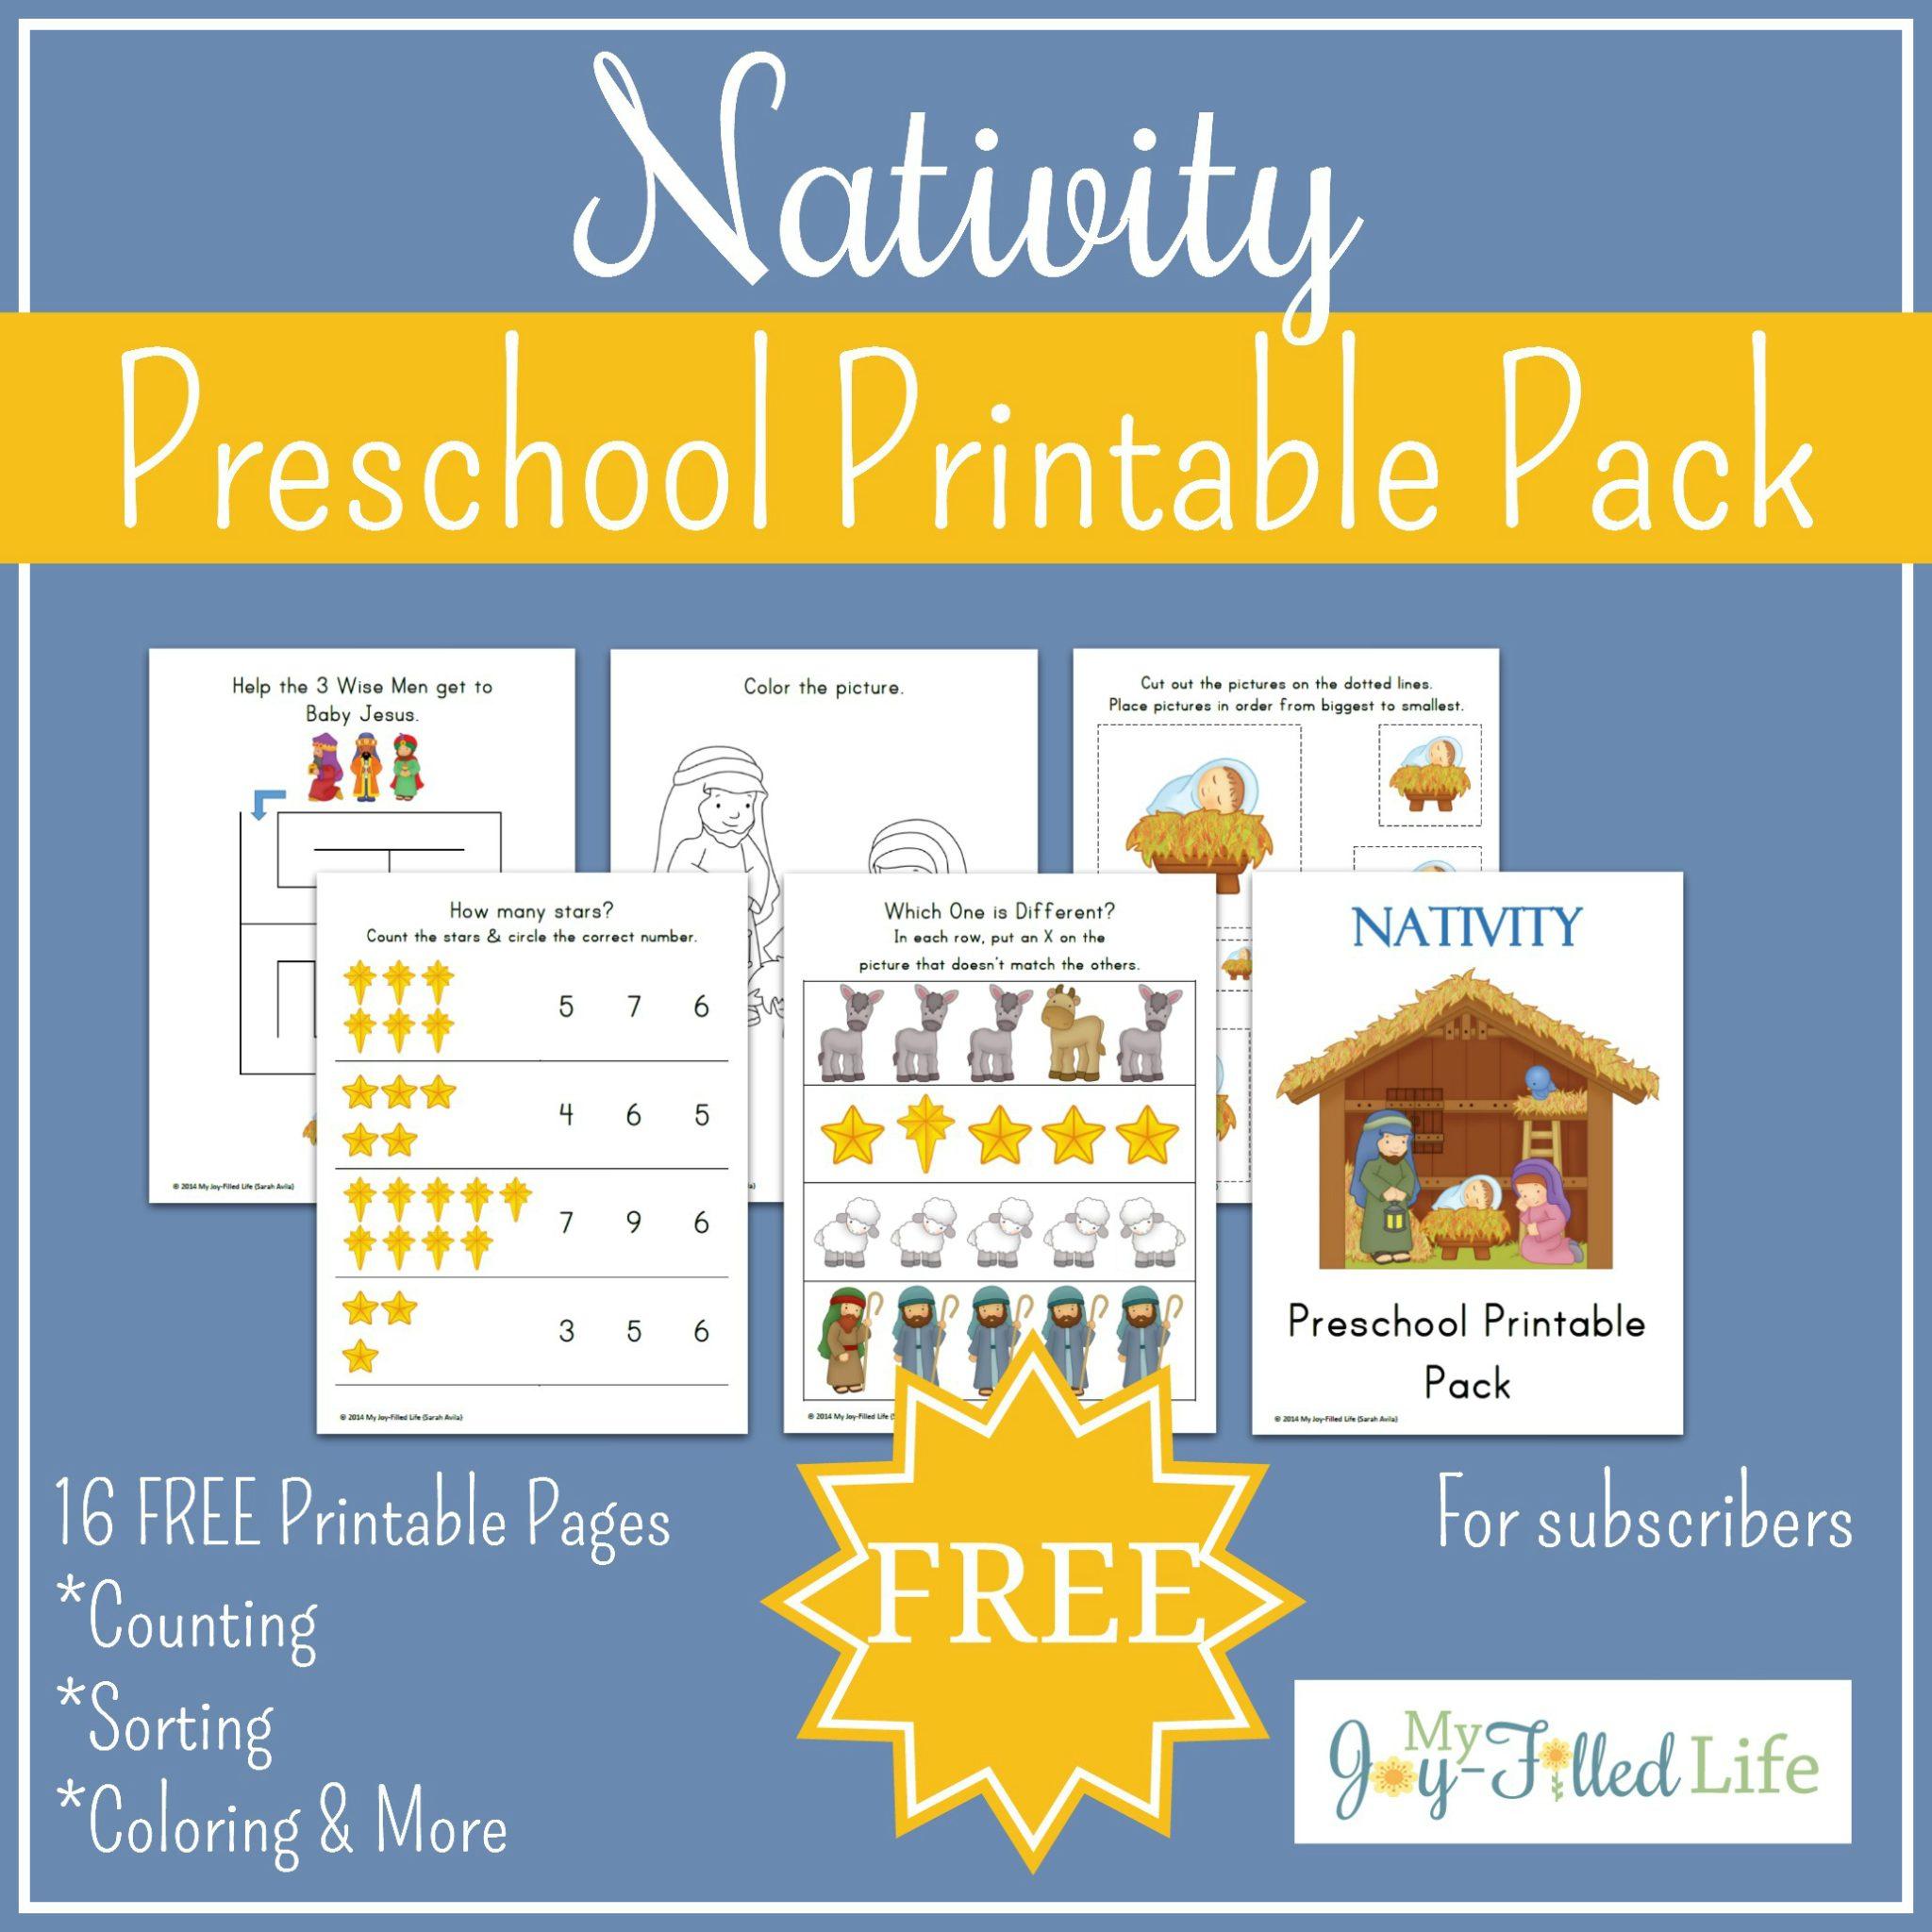 Free Printable Nativity Preschool Pack - My Joy-Filled Life - Printable Nativity Puzzle